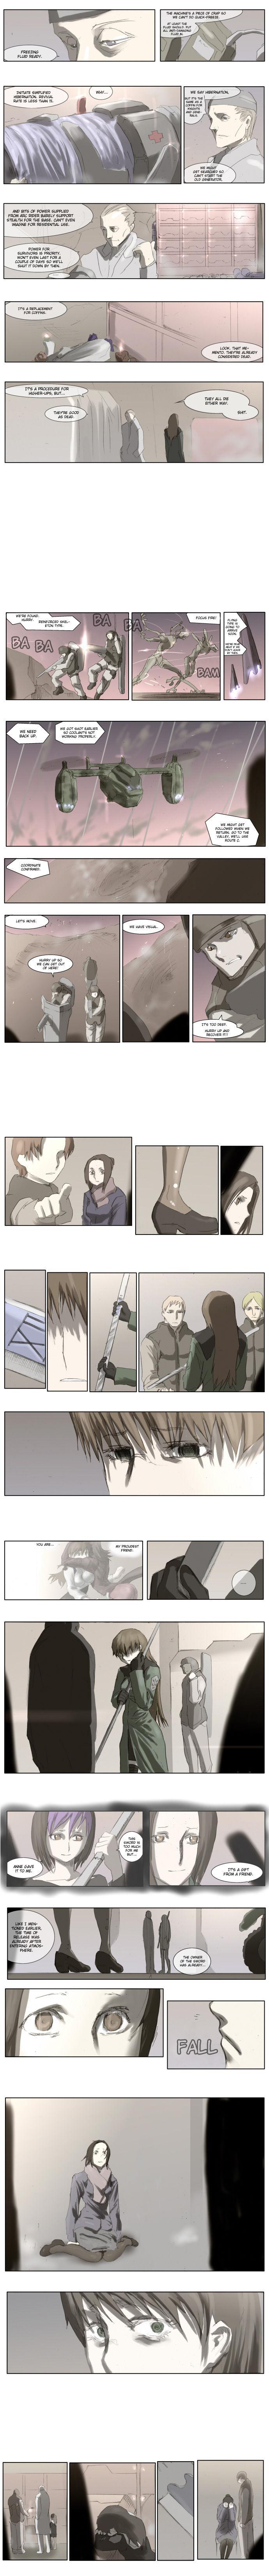 Knight Run 43 Page 3